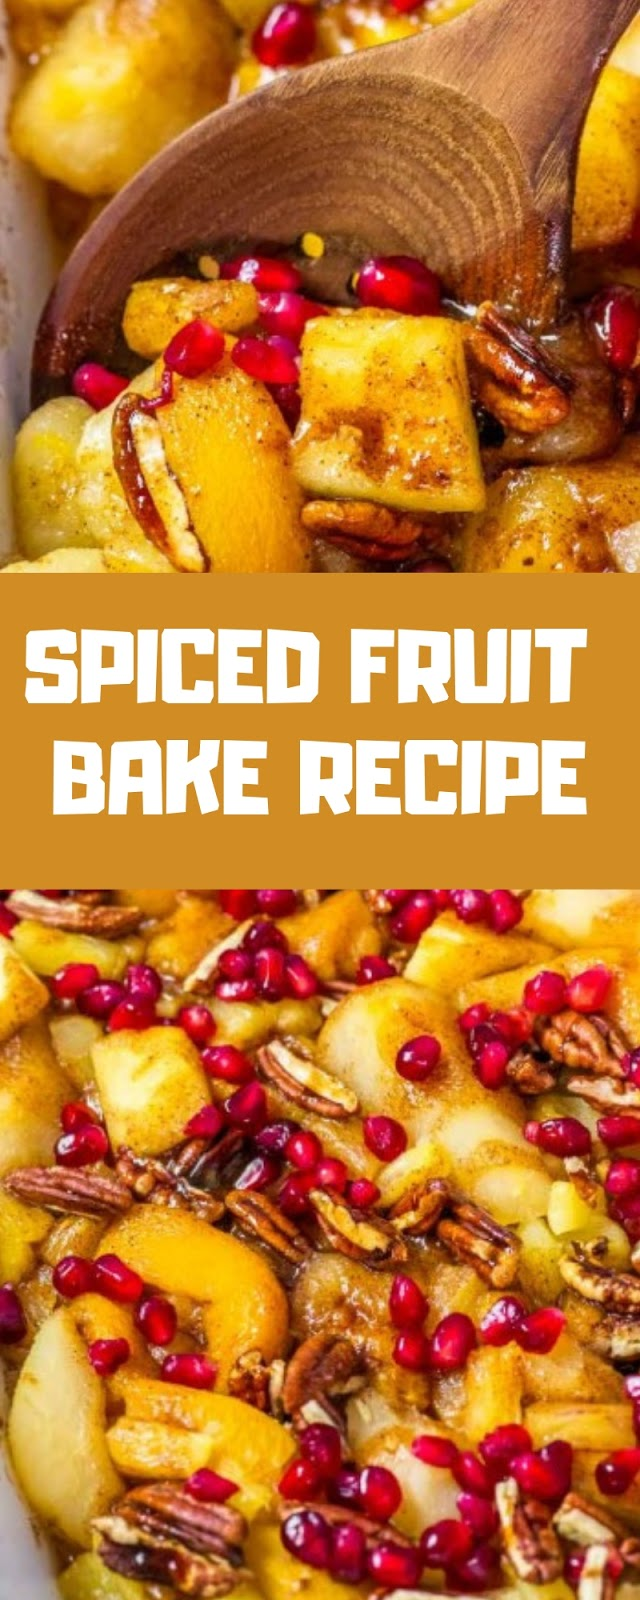 SPICED FRUIT BAKE RECIPE